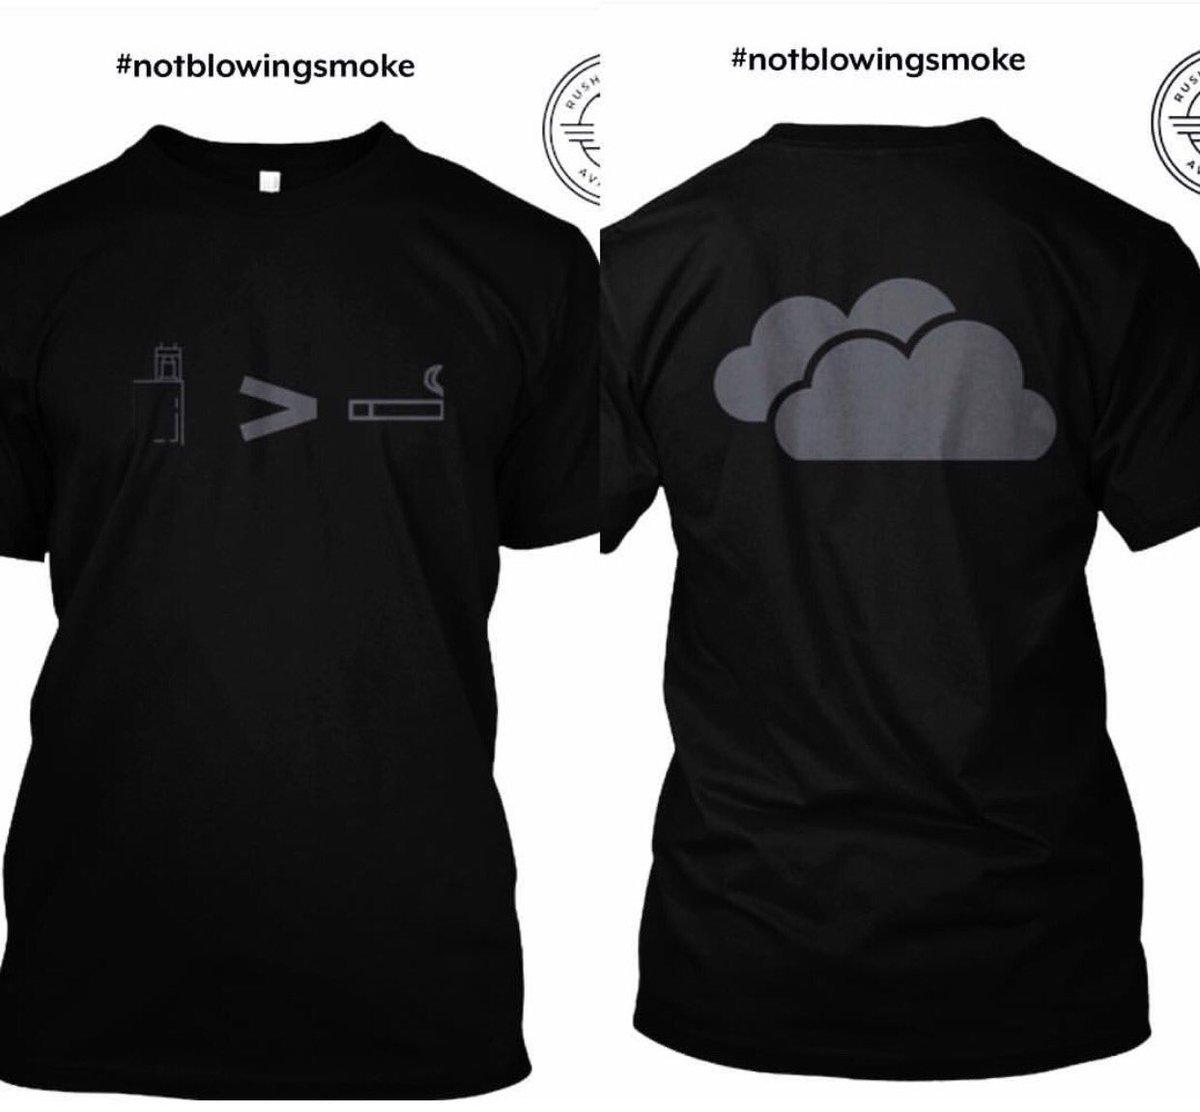 fresh shirt! #vape #vapelife #vape #vapenation #vapesociety #notblowingsmoke #shirts #clothing #RETWEEET  http:// bit.ly/2qTwWPe  &nbsp;  <br>http://pic.twitter.com/pkBQx8Rwn3